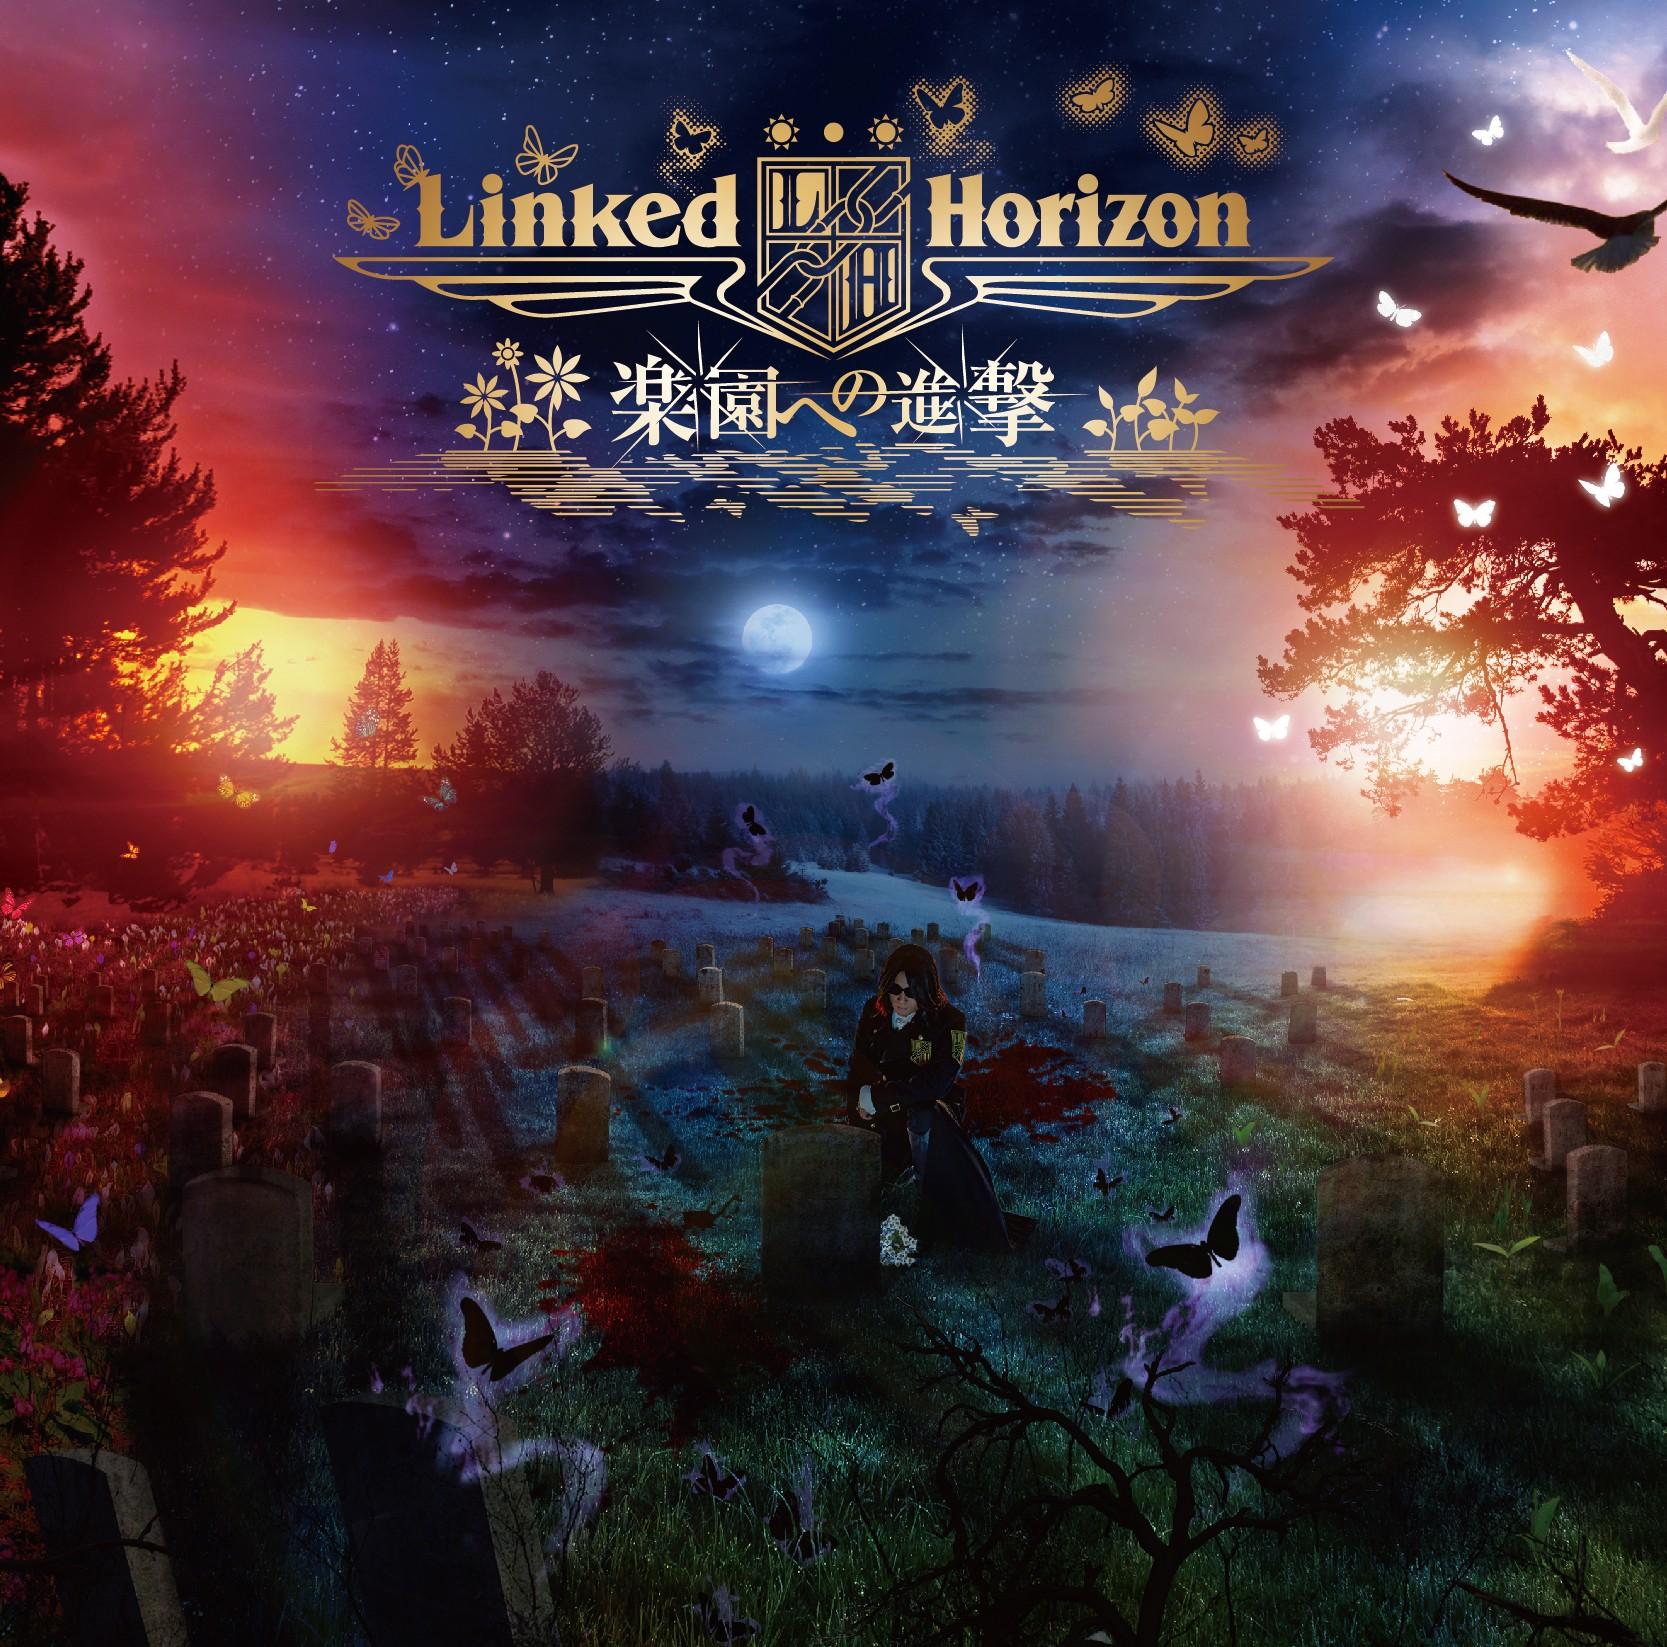 Linked Horizon – 楽園への進撃 [FLAC + AAC 256 / WEB] [2018.09.19]